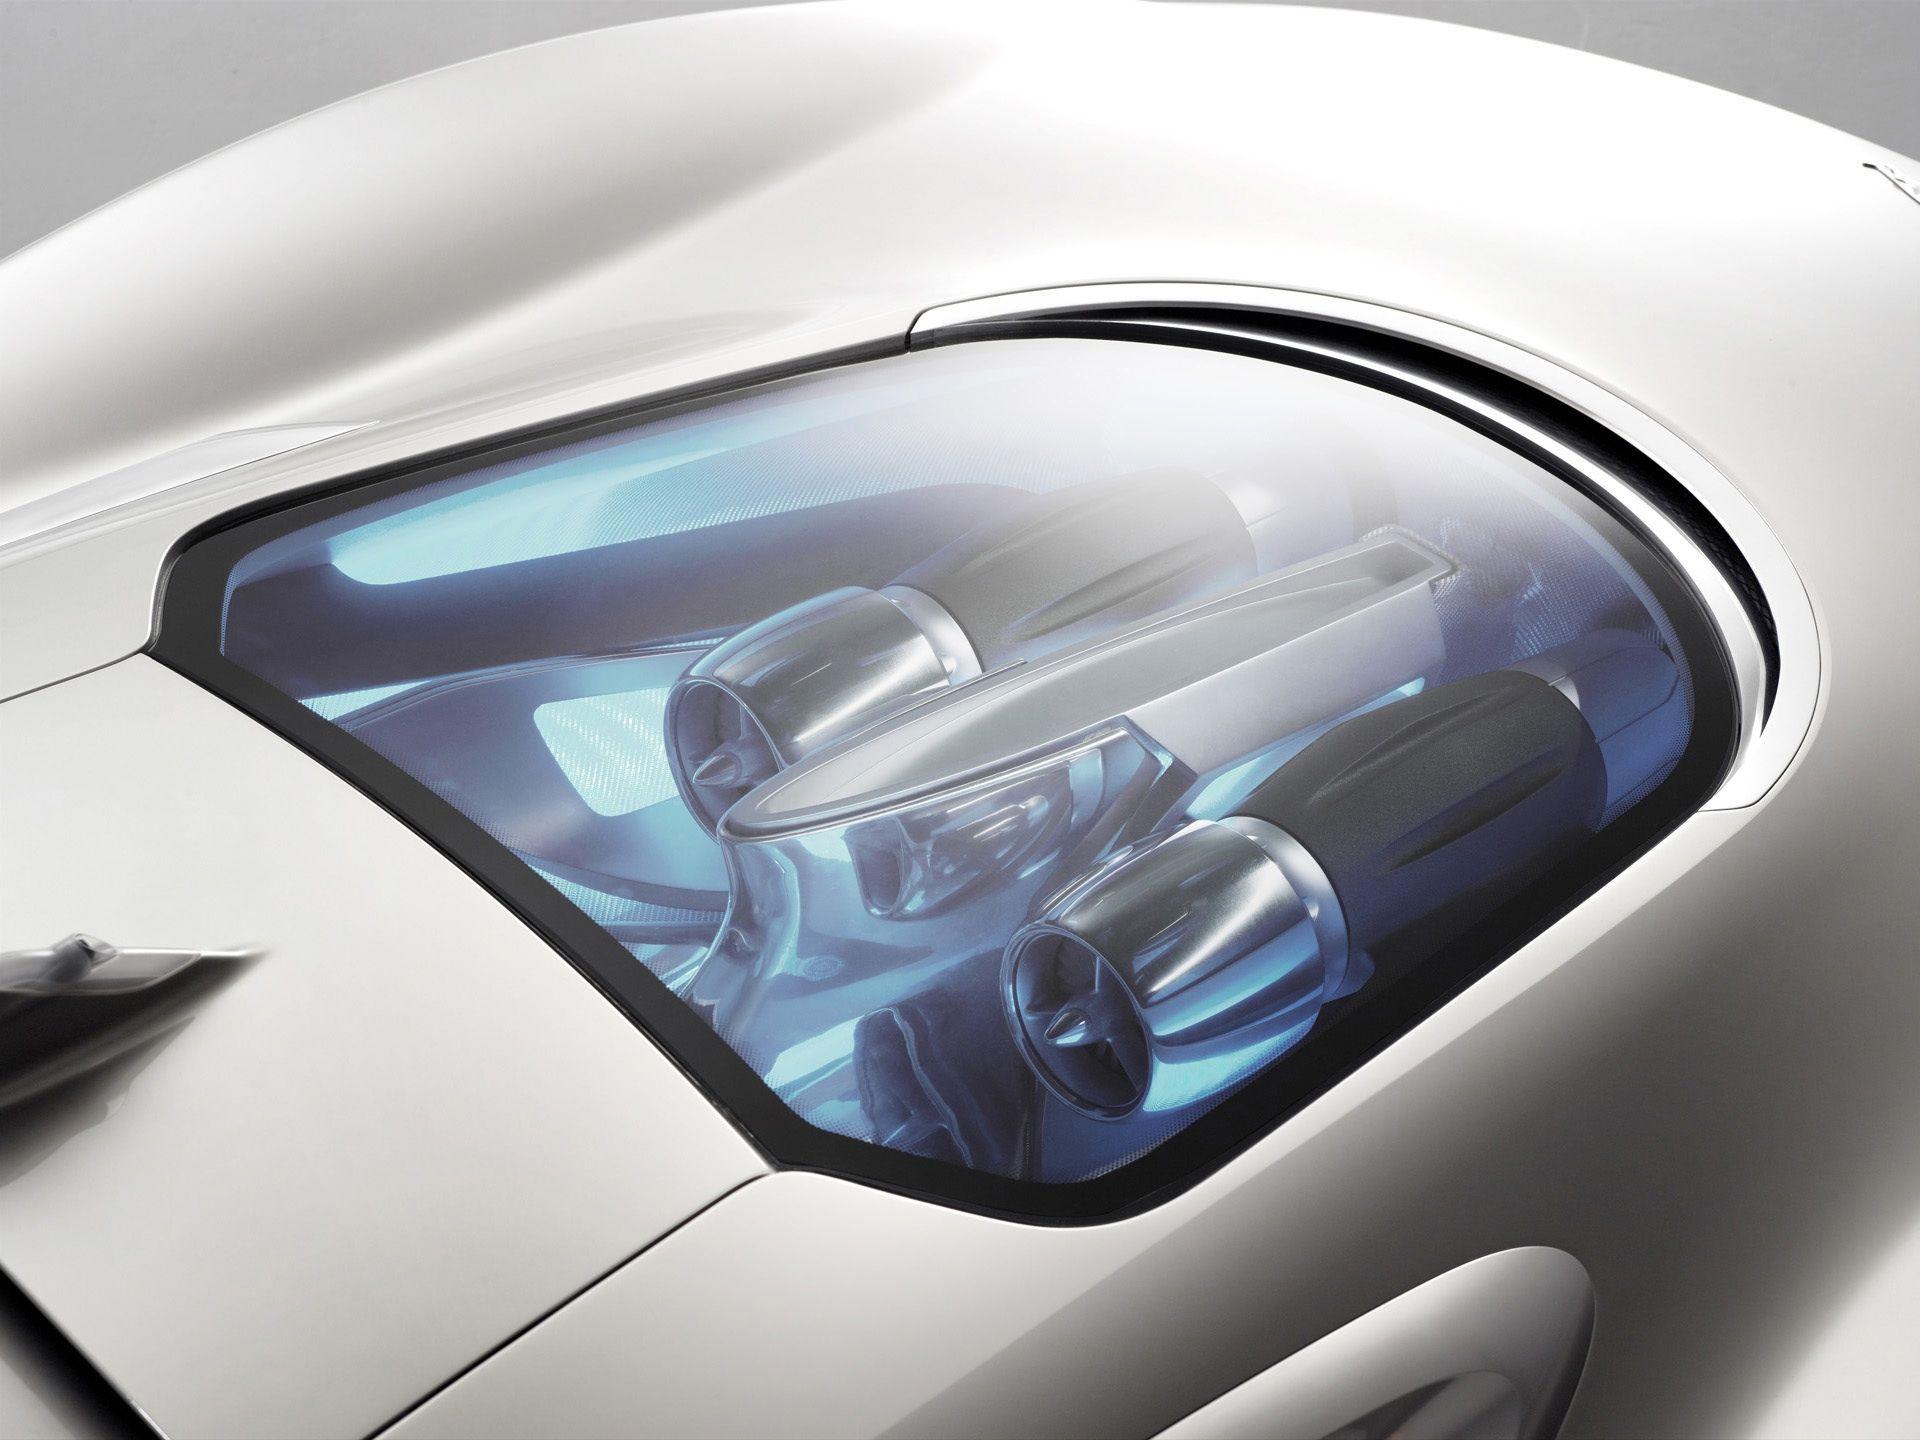 Jaguar CX 16 concept They re actually building this Concept is a